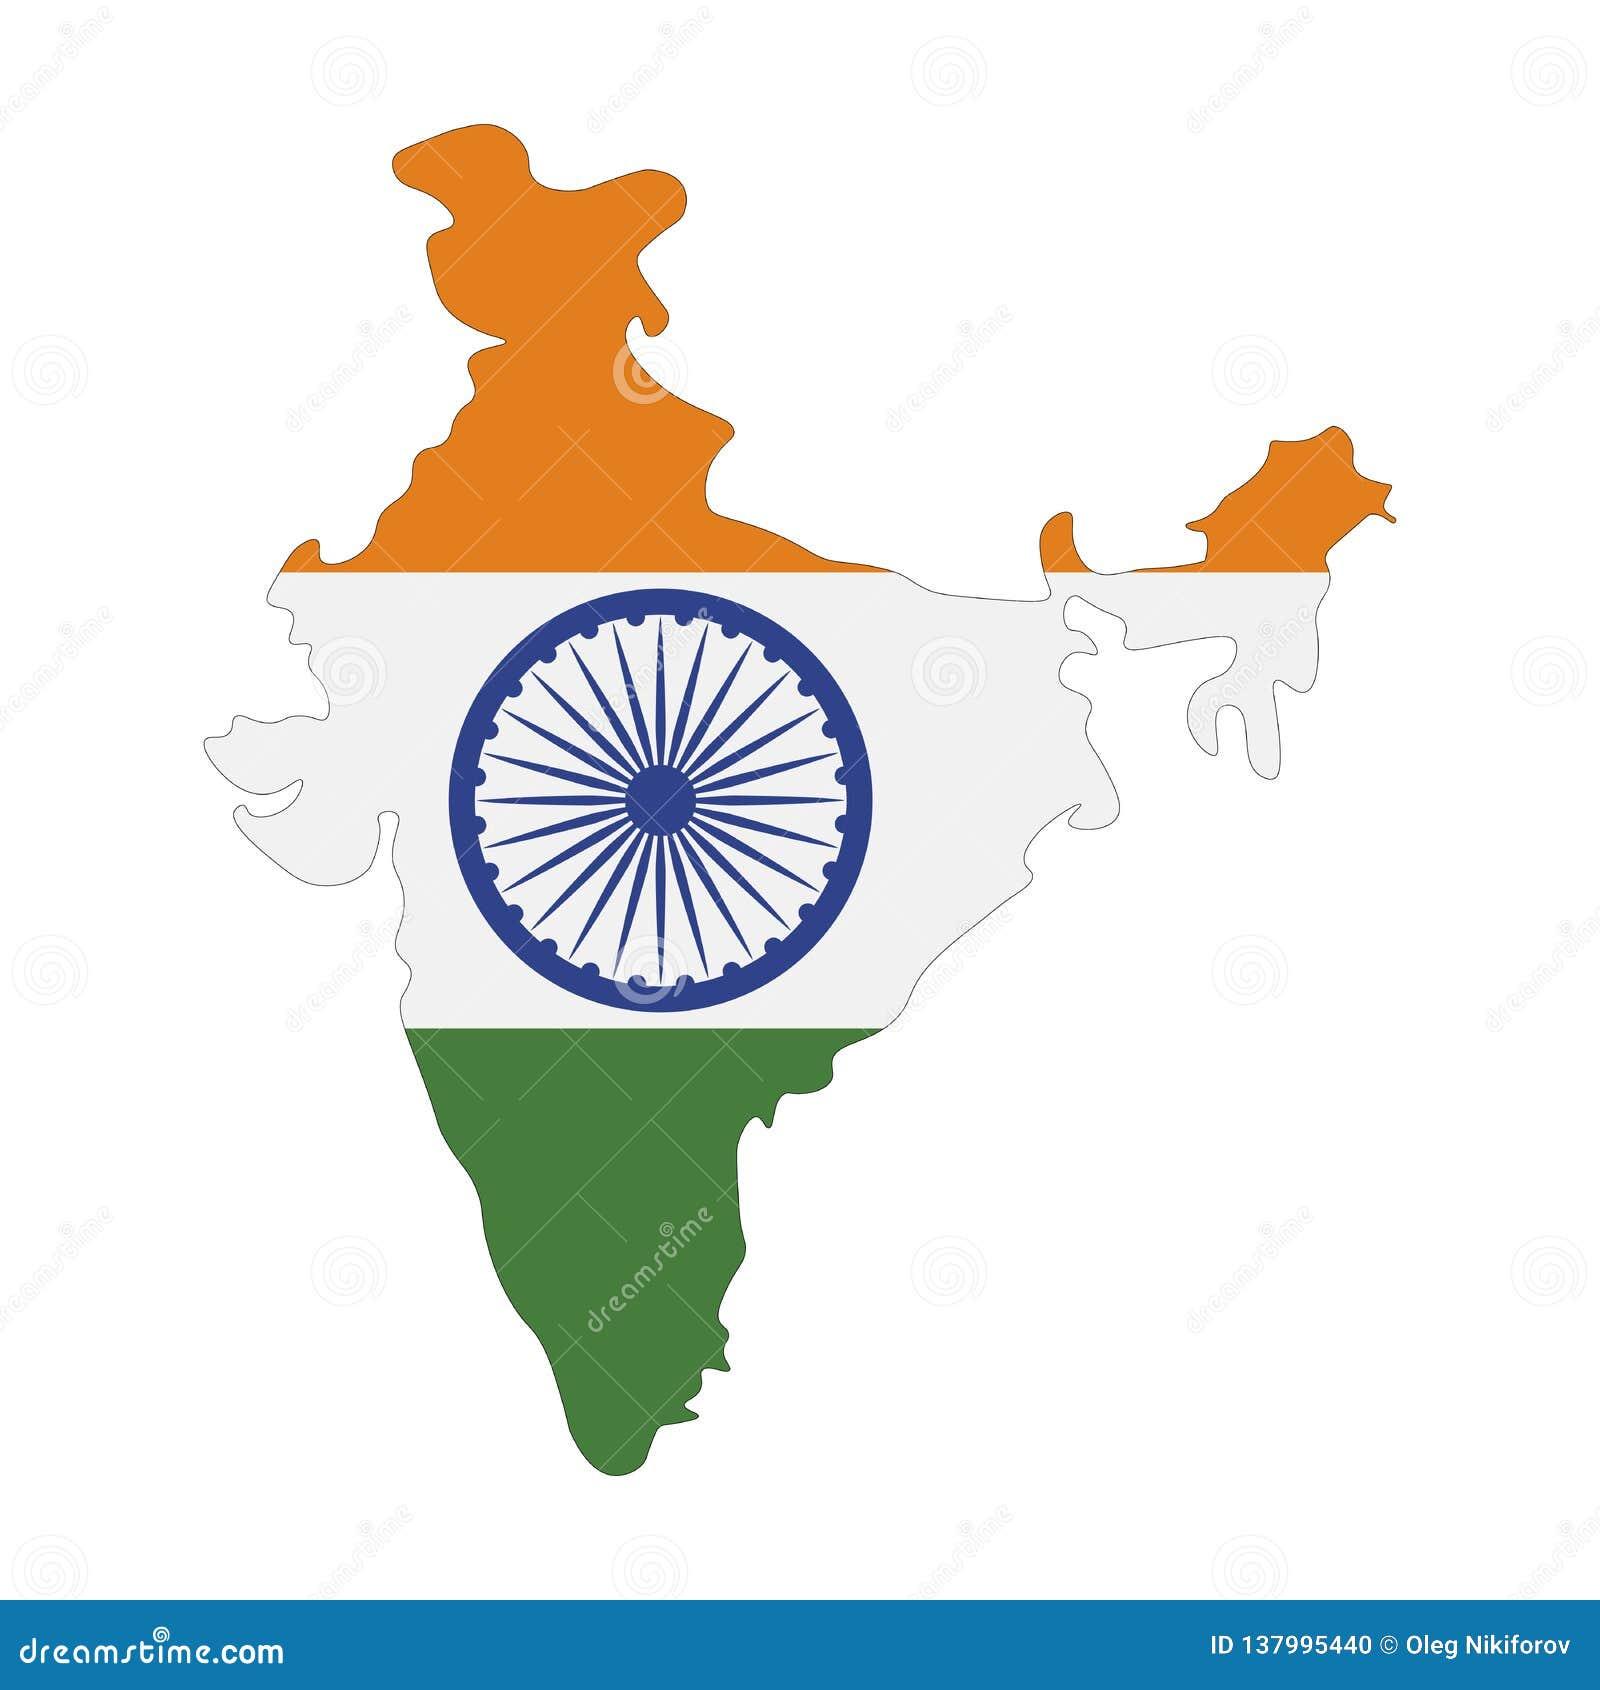 Cartina India.Map India Flag Stock Illustrations 4 226 Map India Flag Stock Illustrations Vectors Clipart Dreamstime